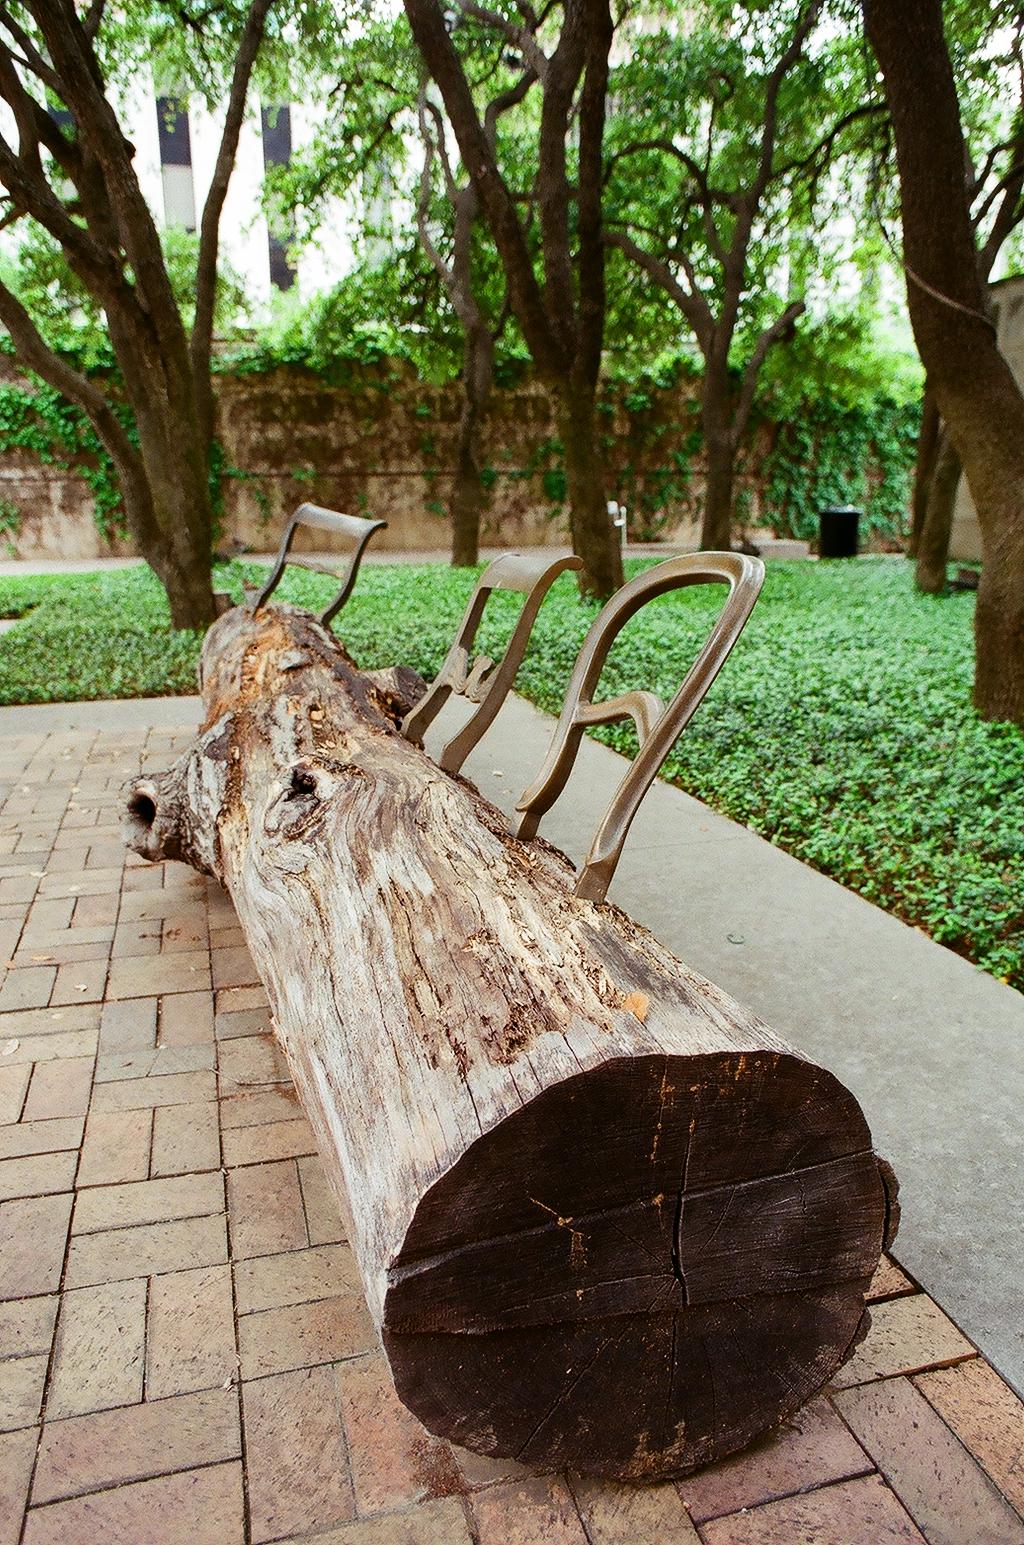 Tree Trunk Bench - by Jurgen Bey, Droog Design, The Netherlands (1999)